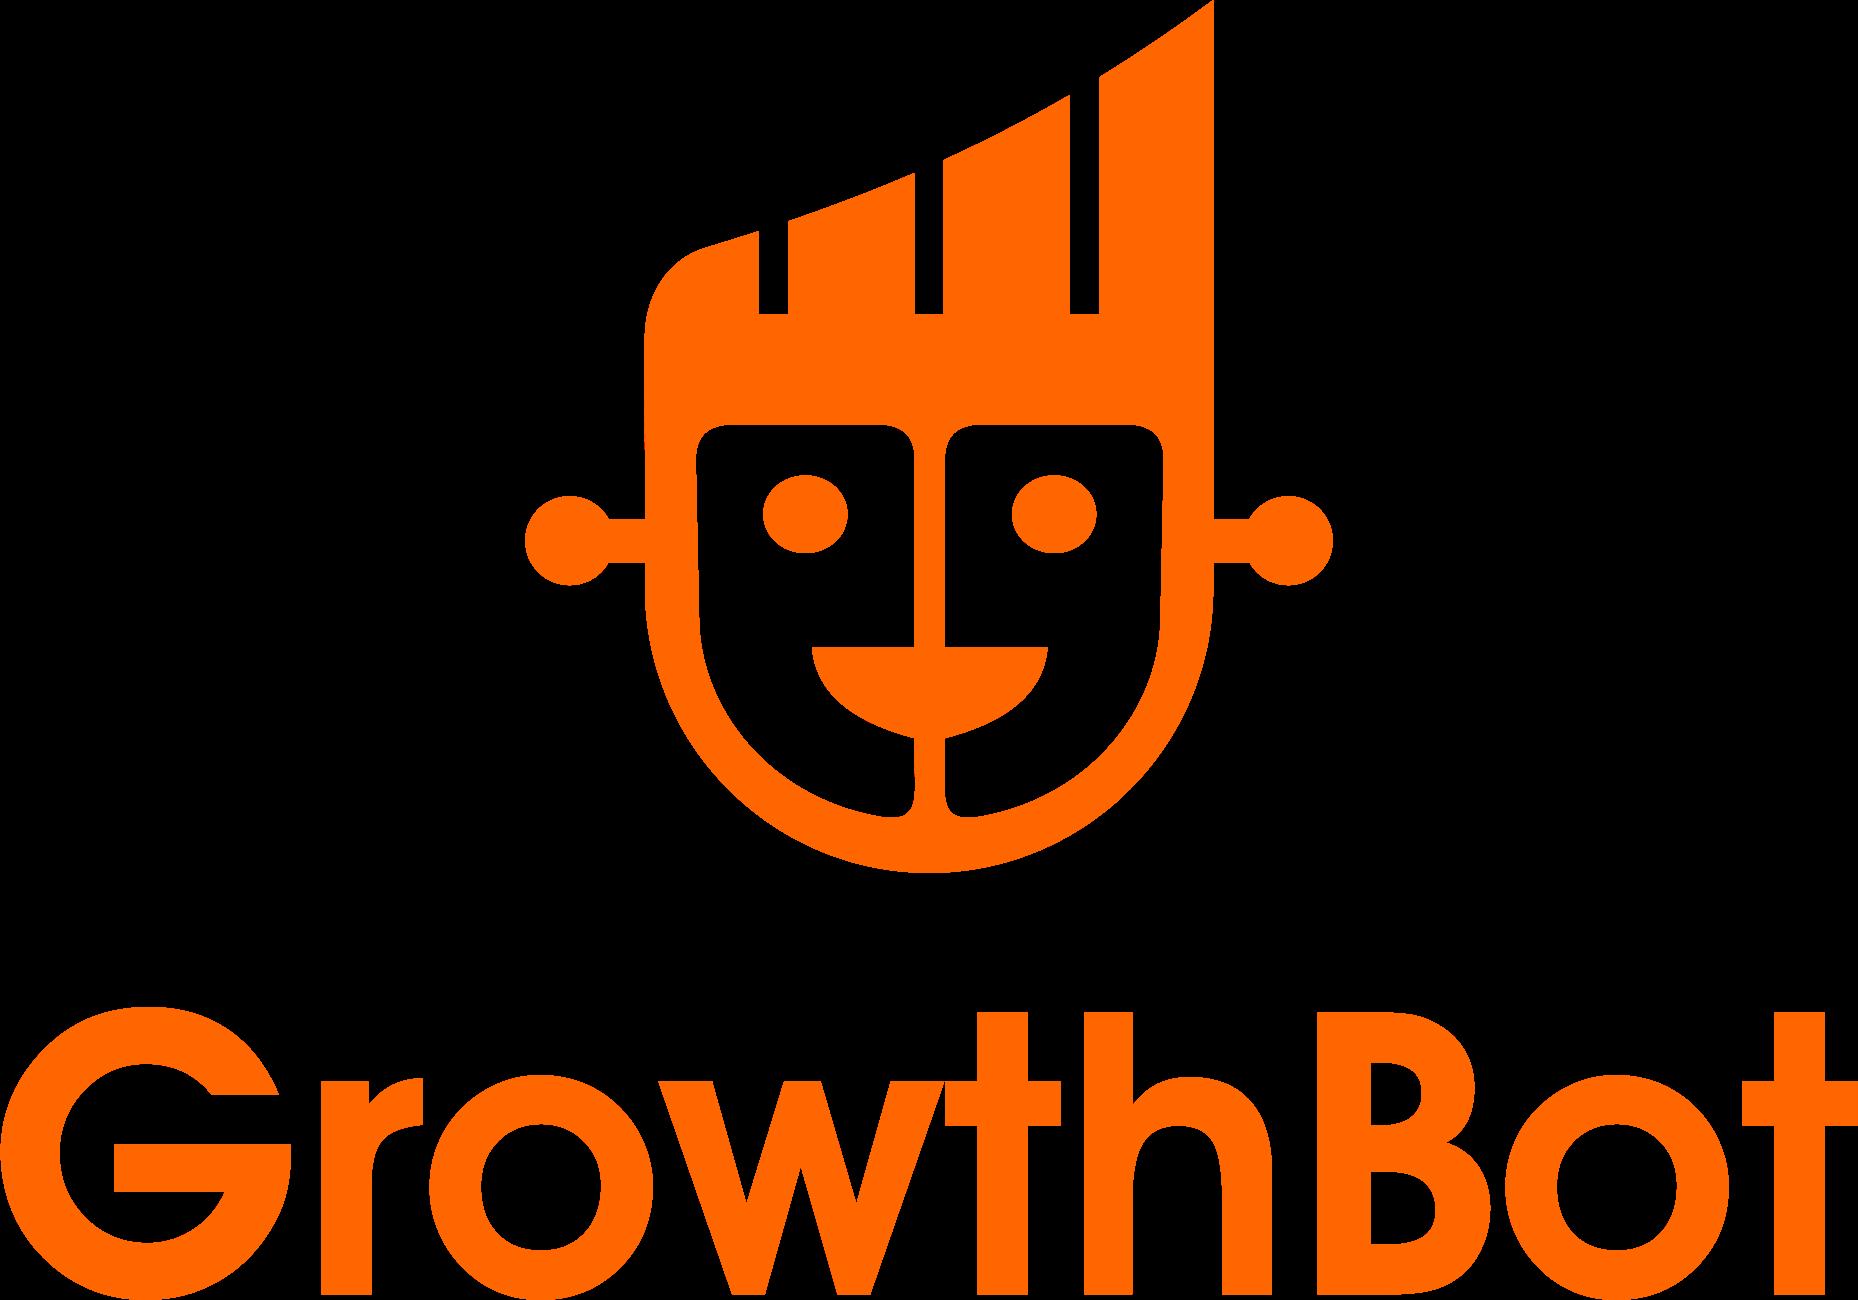 growth bot logo transparent bg.png